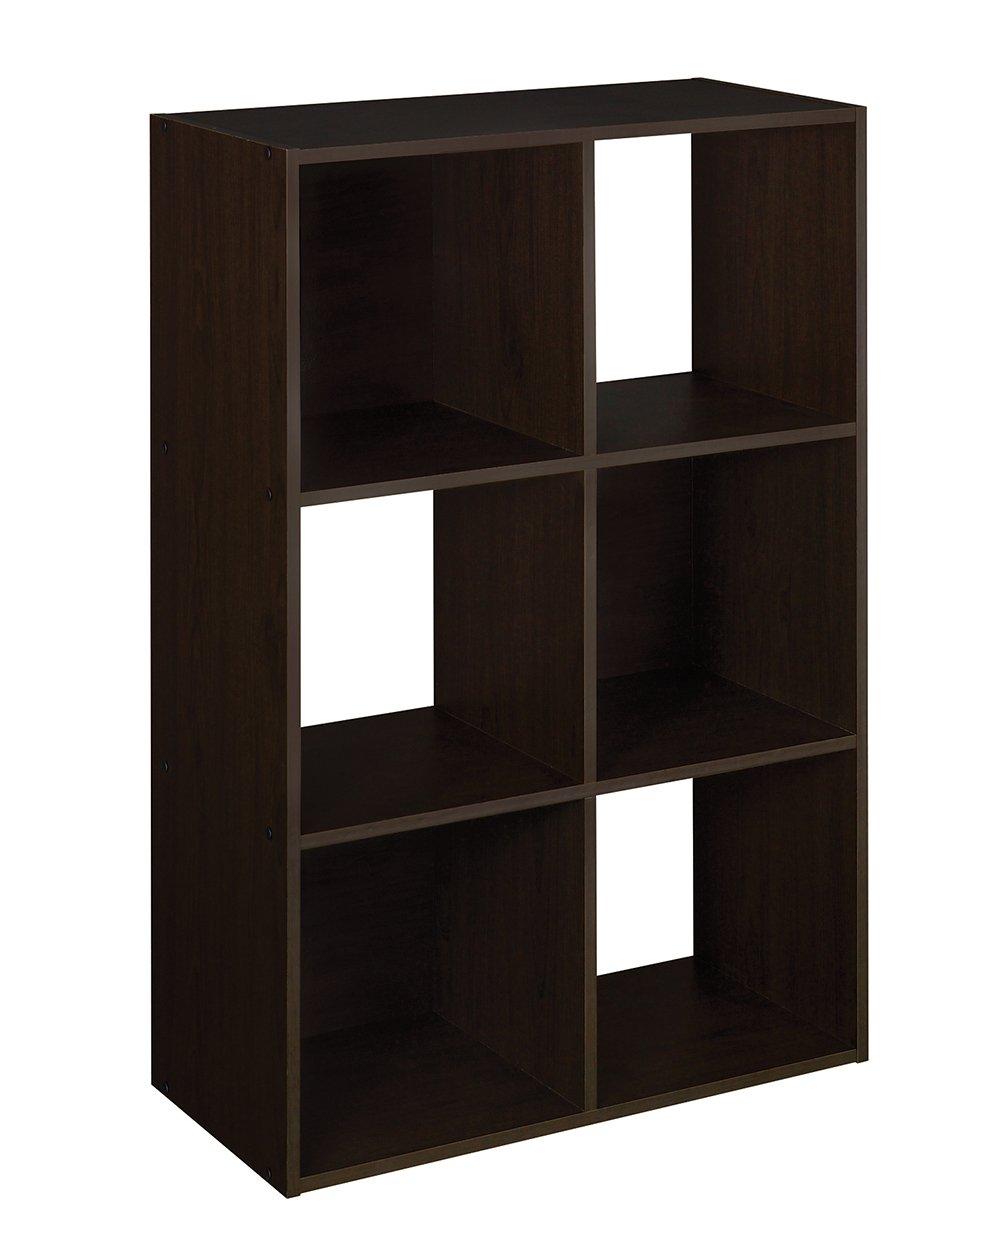 Amazon com closetmaid 78815 cubeicals organizer 6 cube espresso closetmaid home kitchen